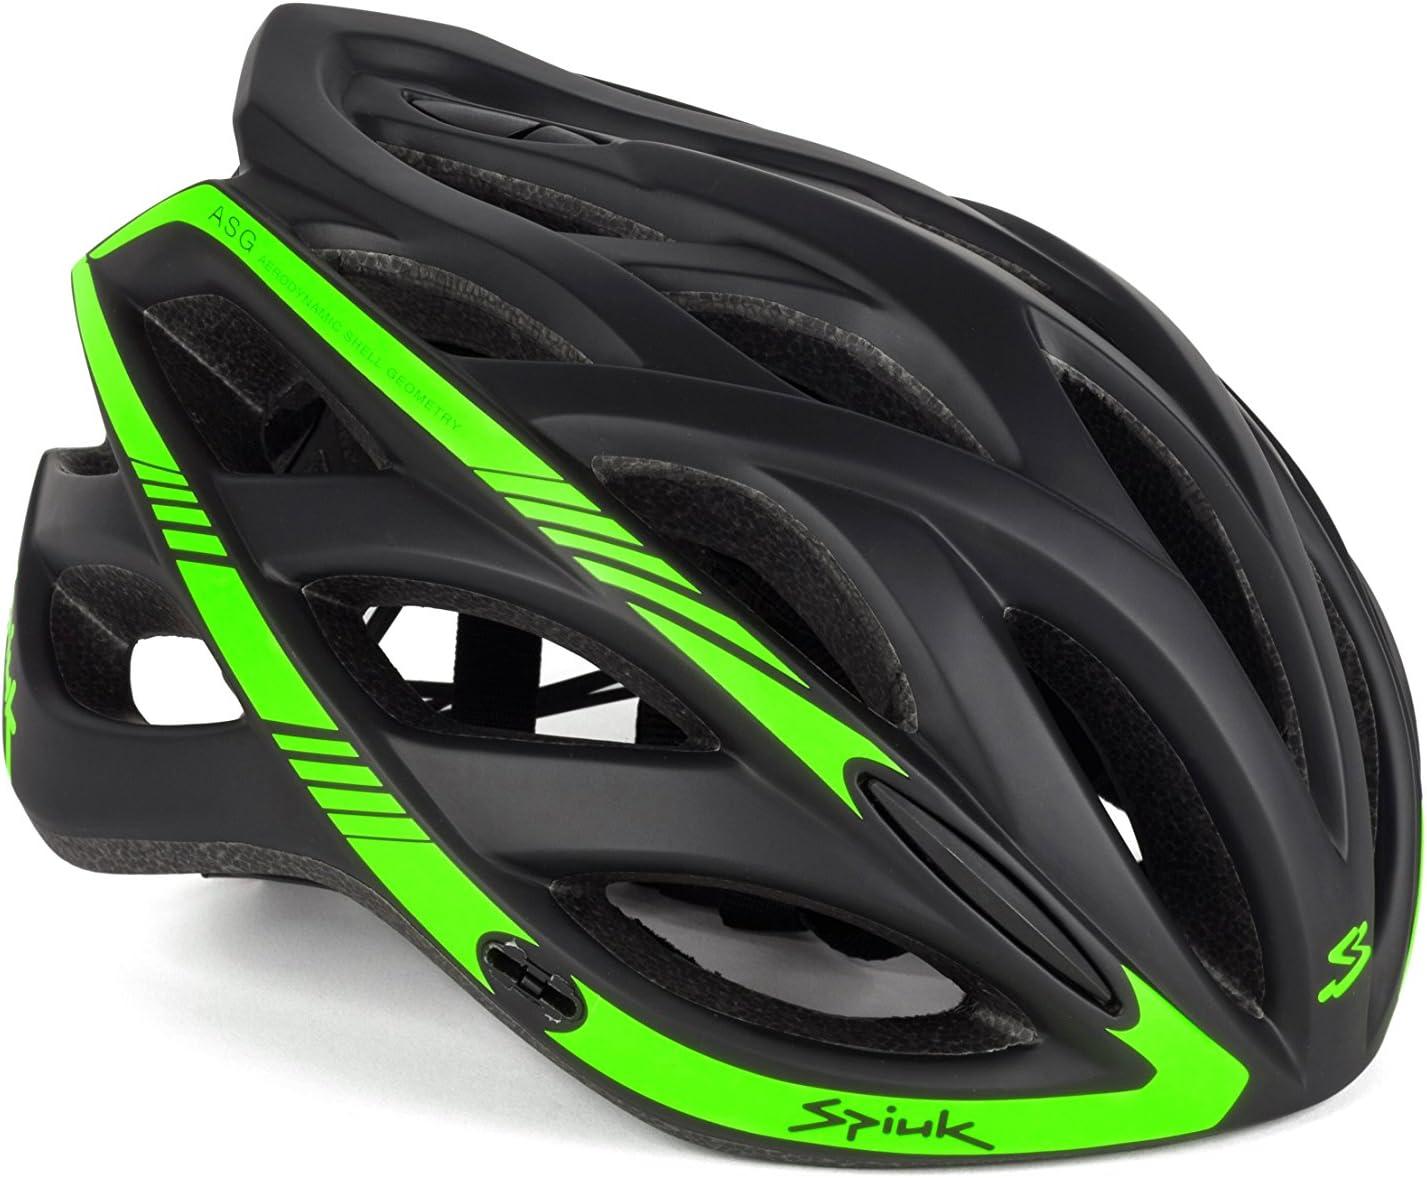 Spiuk Keilan - Casco Unisex, Color Negro/Verde, Talla 57-61 ...